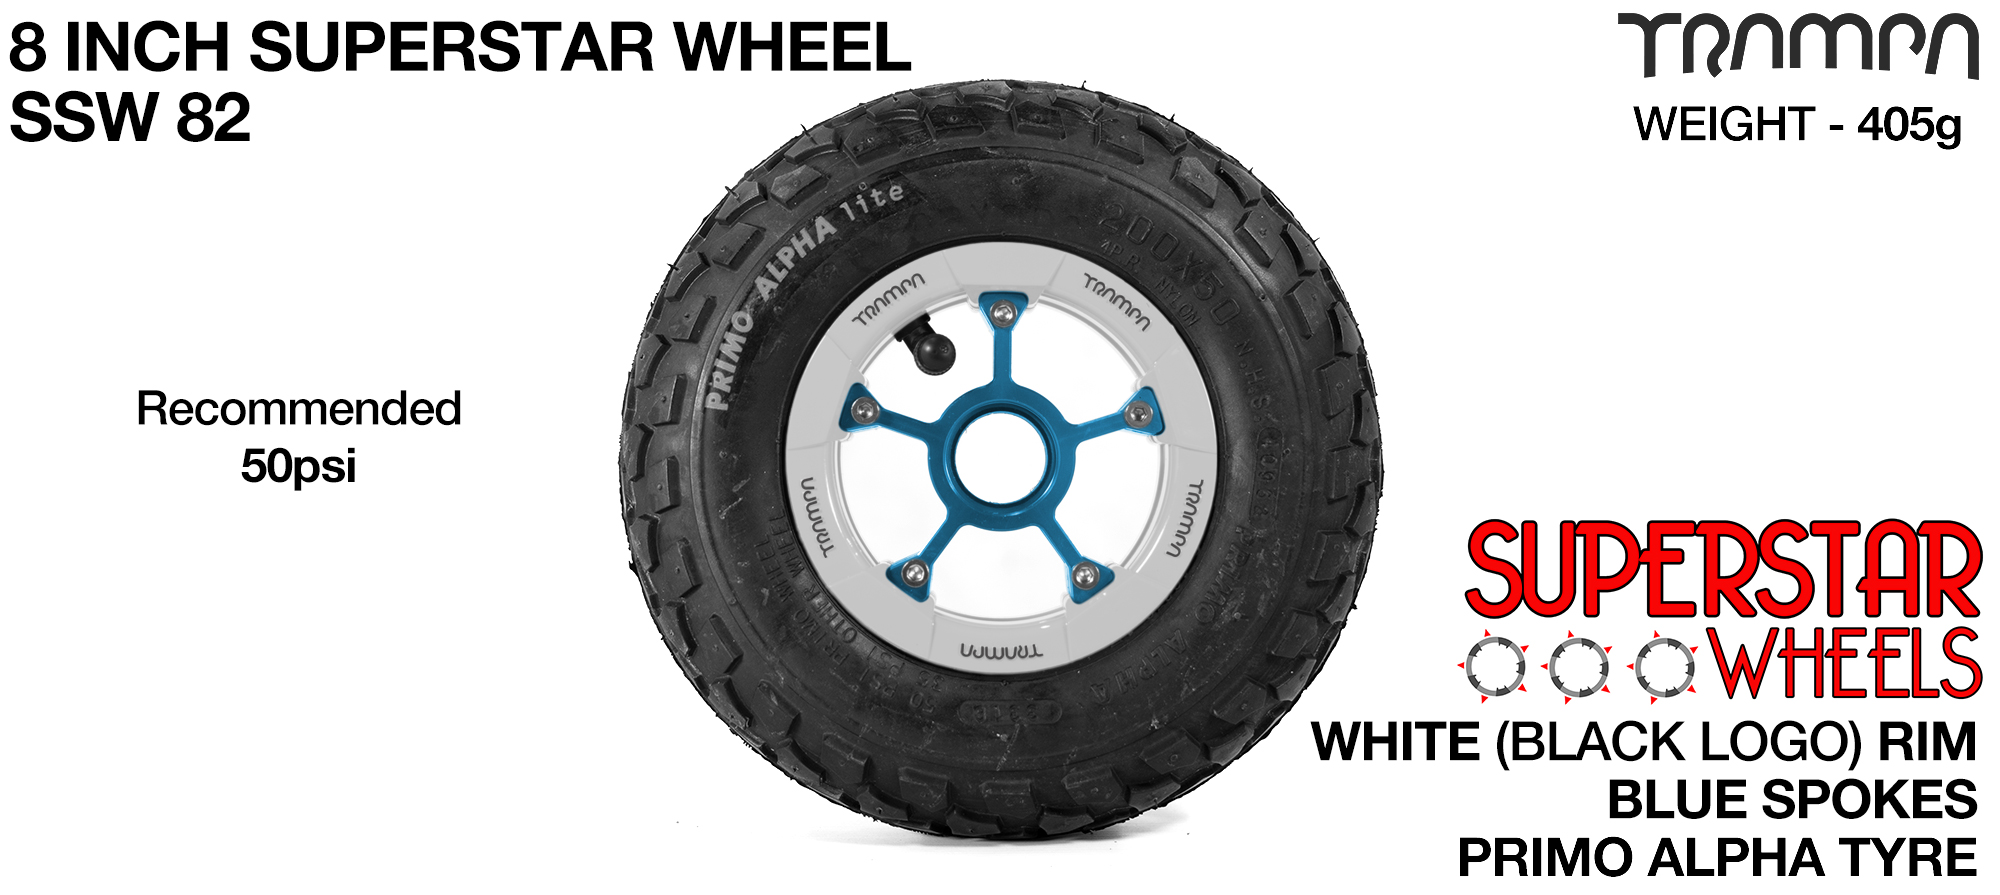 Superstar 8 inch wheel - White Gloss & Black logo Rim Blue Anodised Spokes & Black Alpha 8 Inch Tyre